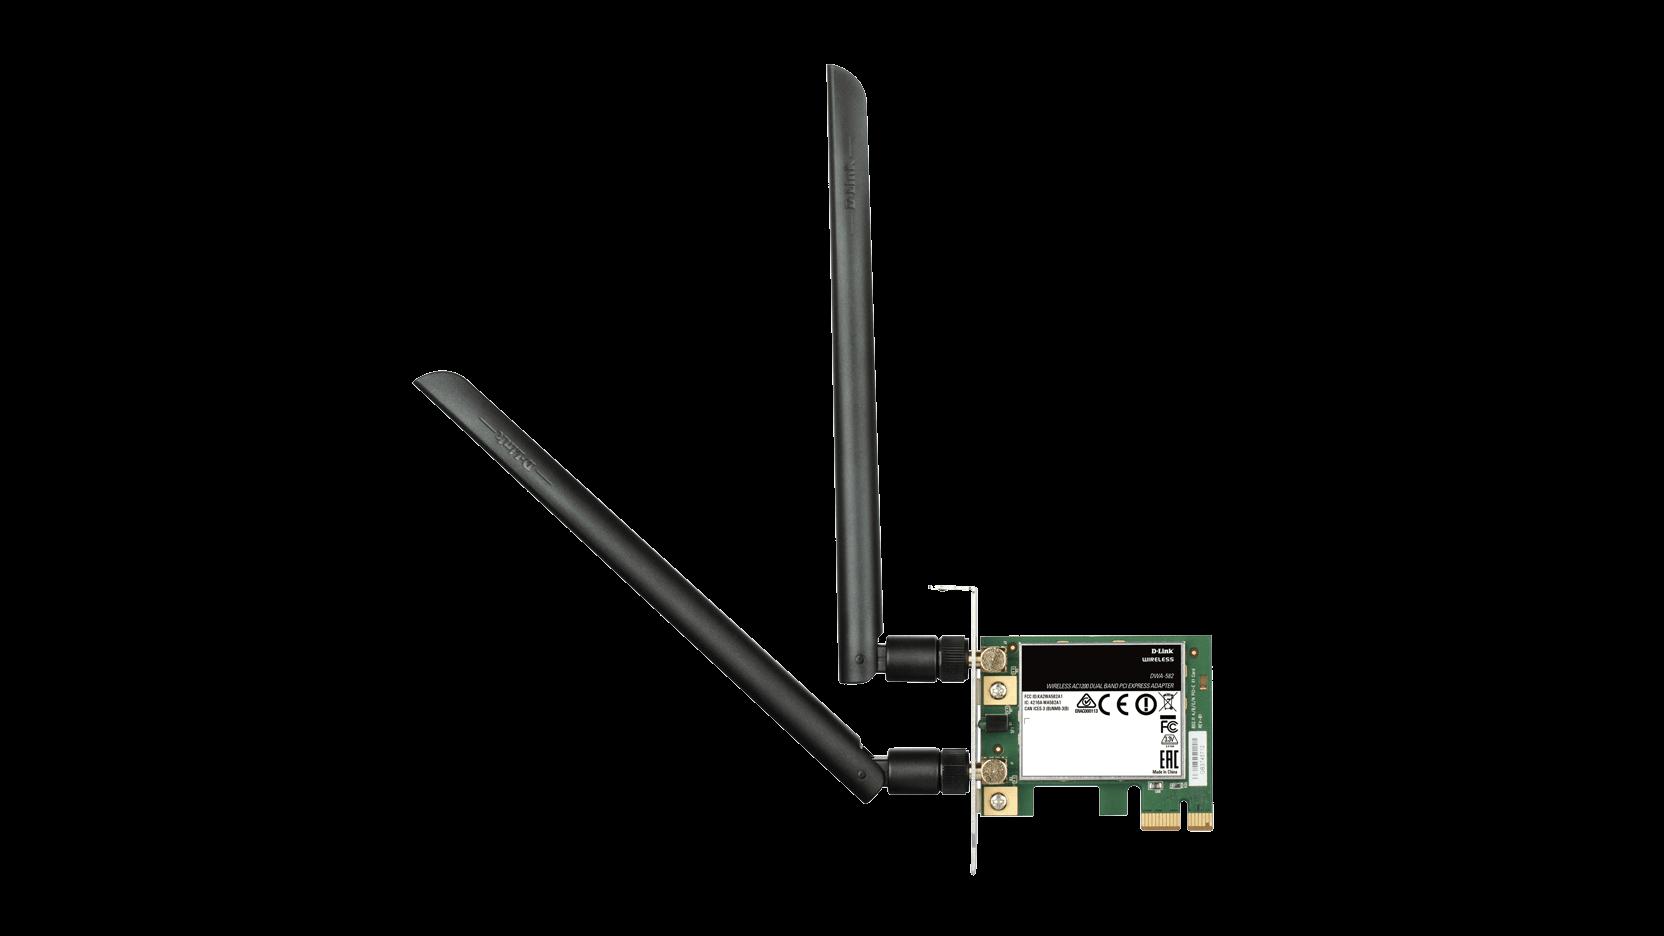 Dir 842 Wireless Ac Mu Mimo Dual Band Router